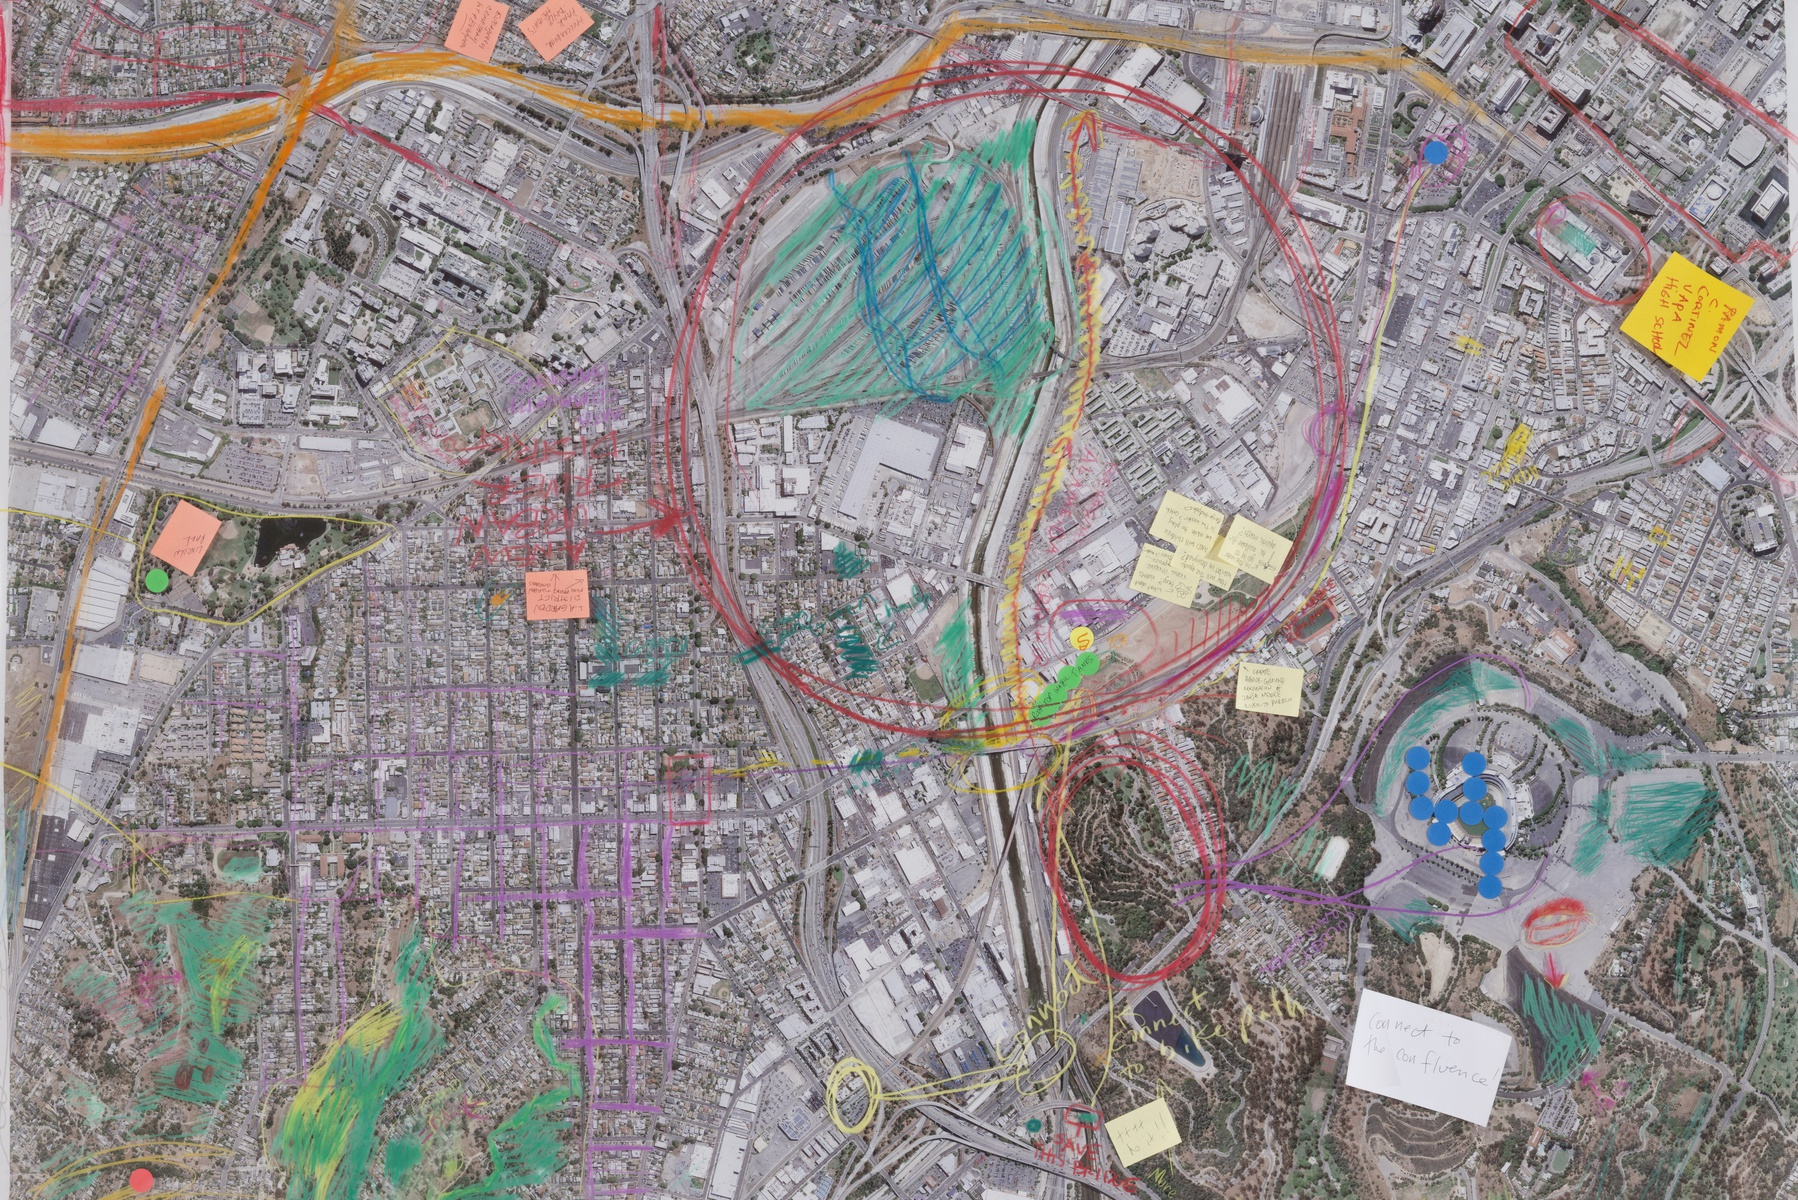 Community mapping exercise mixed media on acetate